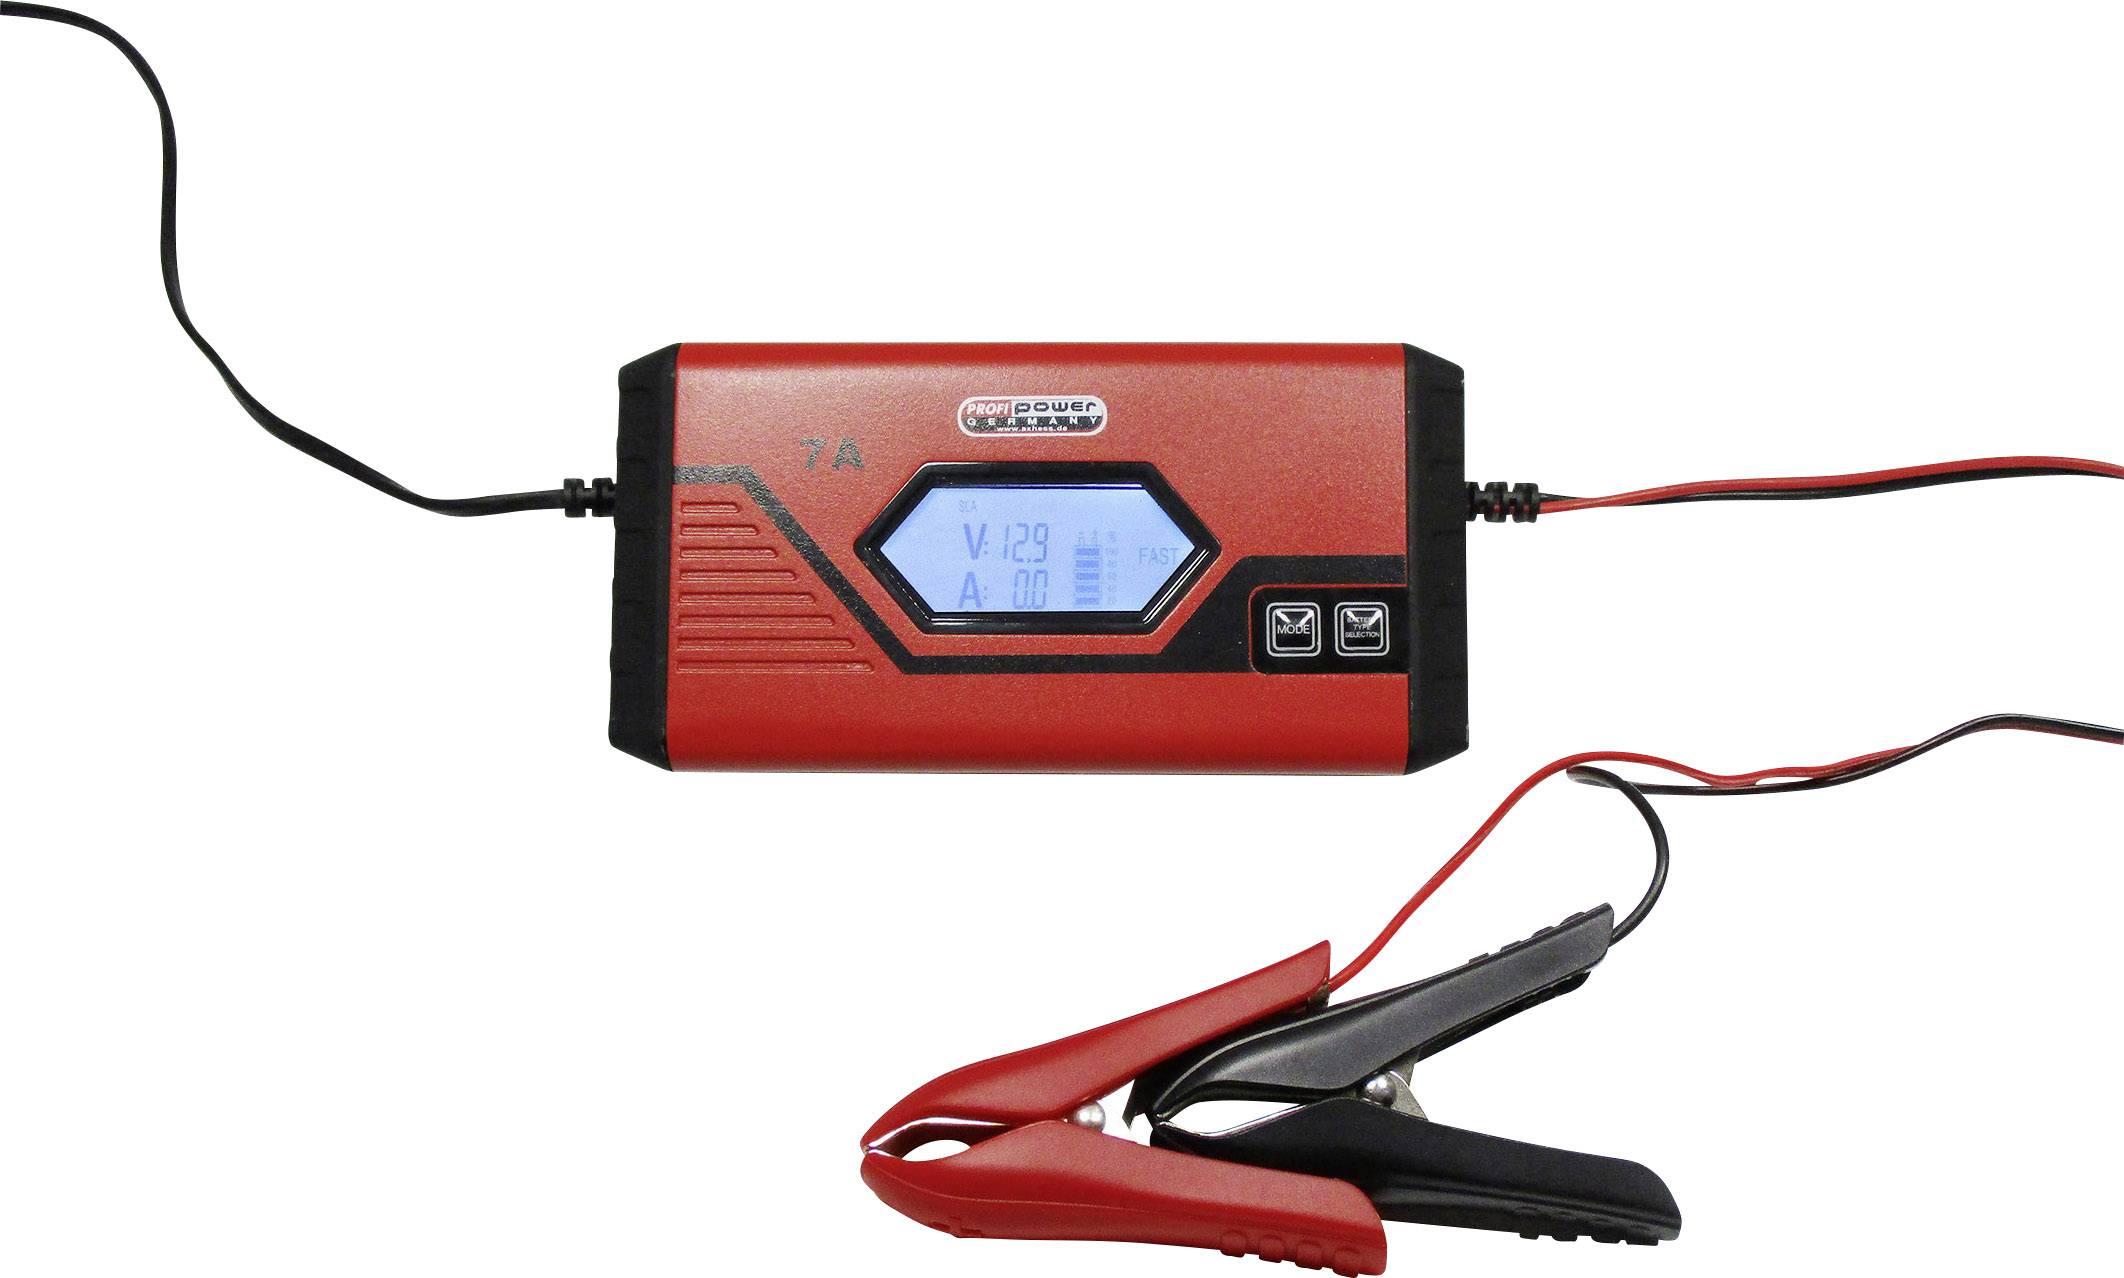 Nabíjačka autobatérie Profi Power 2913908, 12 V, 3.5 A, 7 A